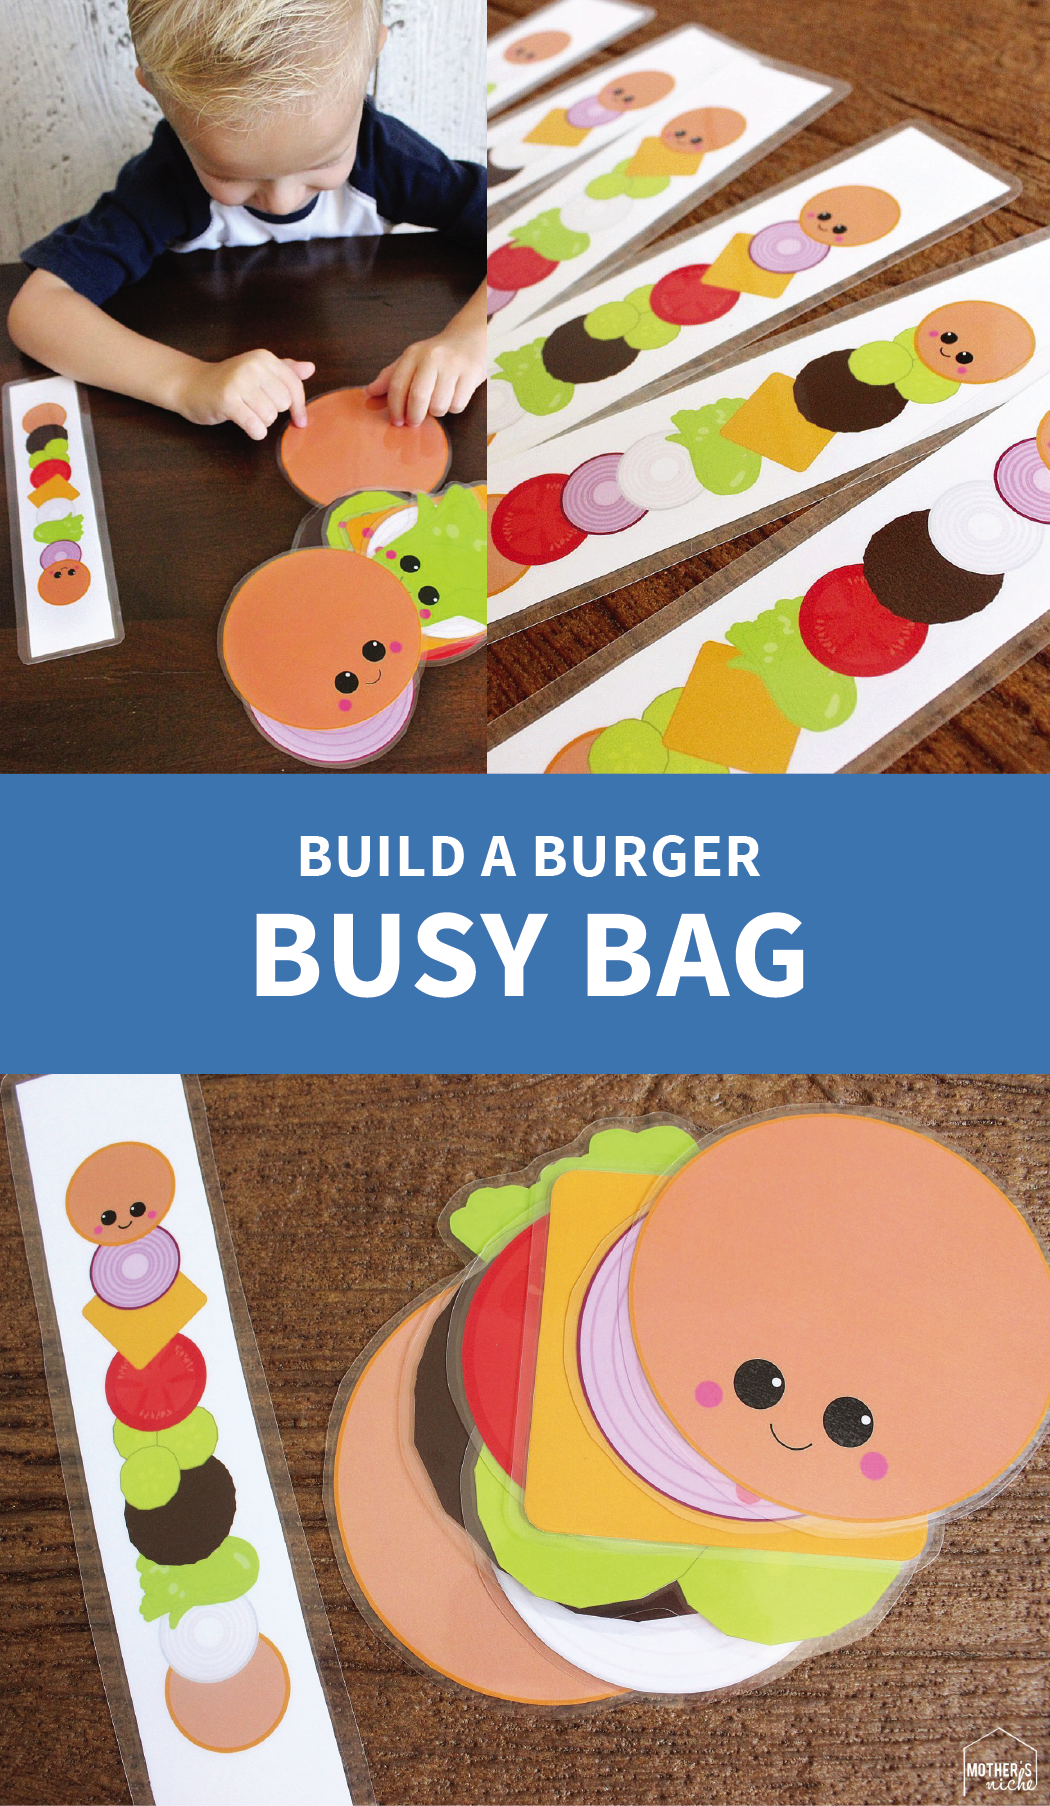 Build A Burger Busy Bag Printables Actividades Montessori Juegos Educativos Para Ninos Juegos Para Preescolar